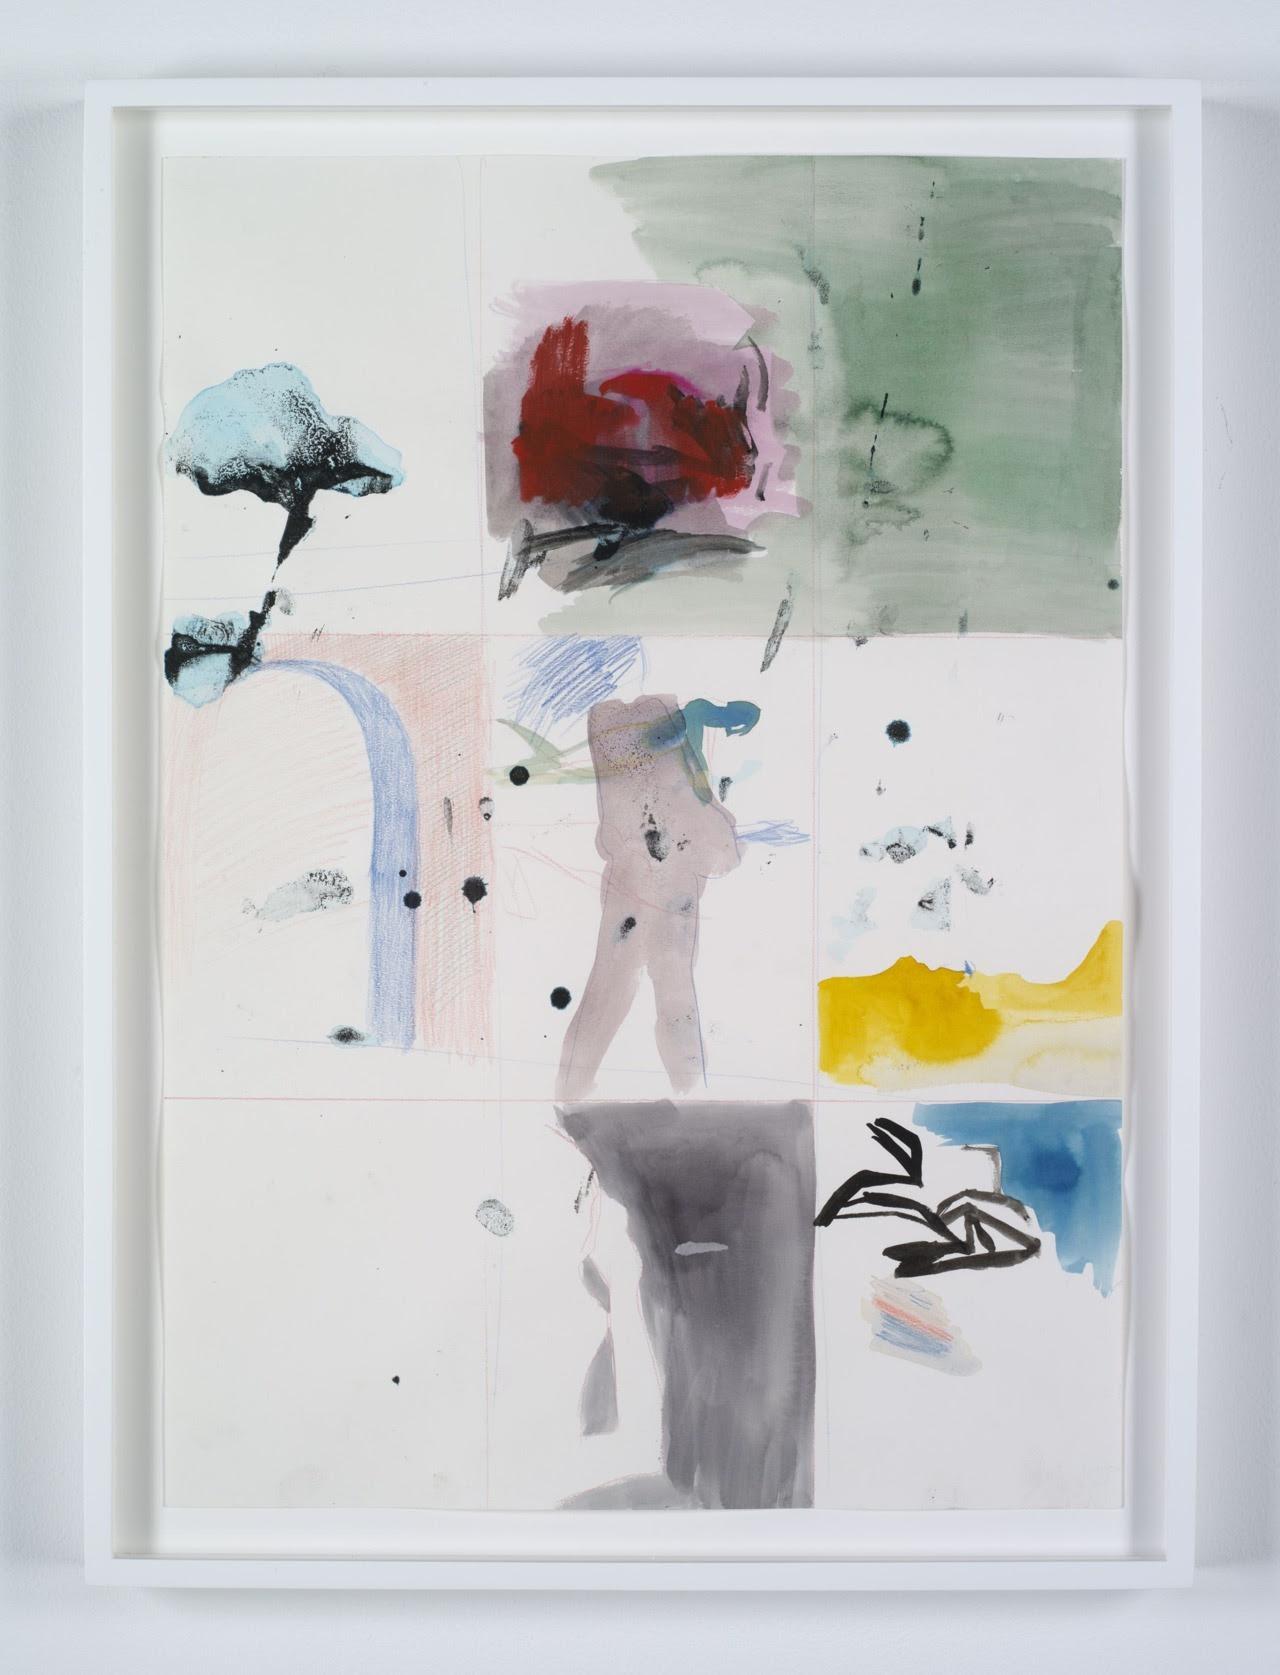 artspotting:  Nick Mauss at 303 Gallery New York via Contemporary ARt Daily